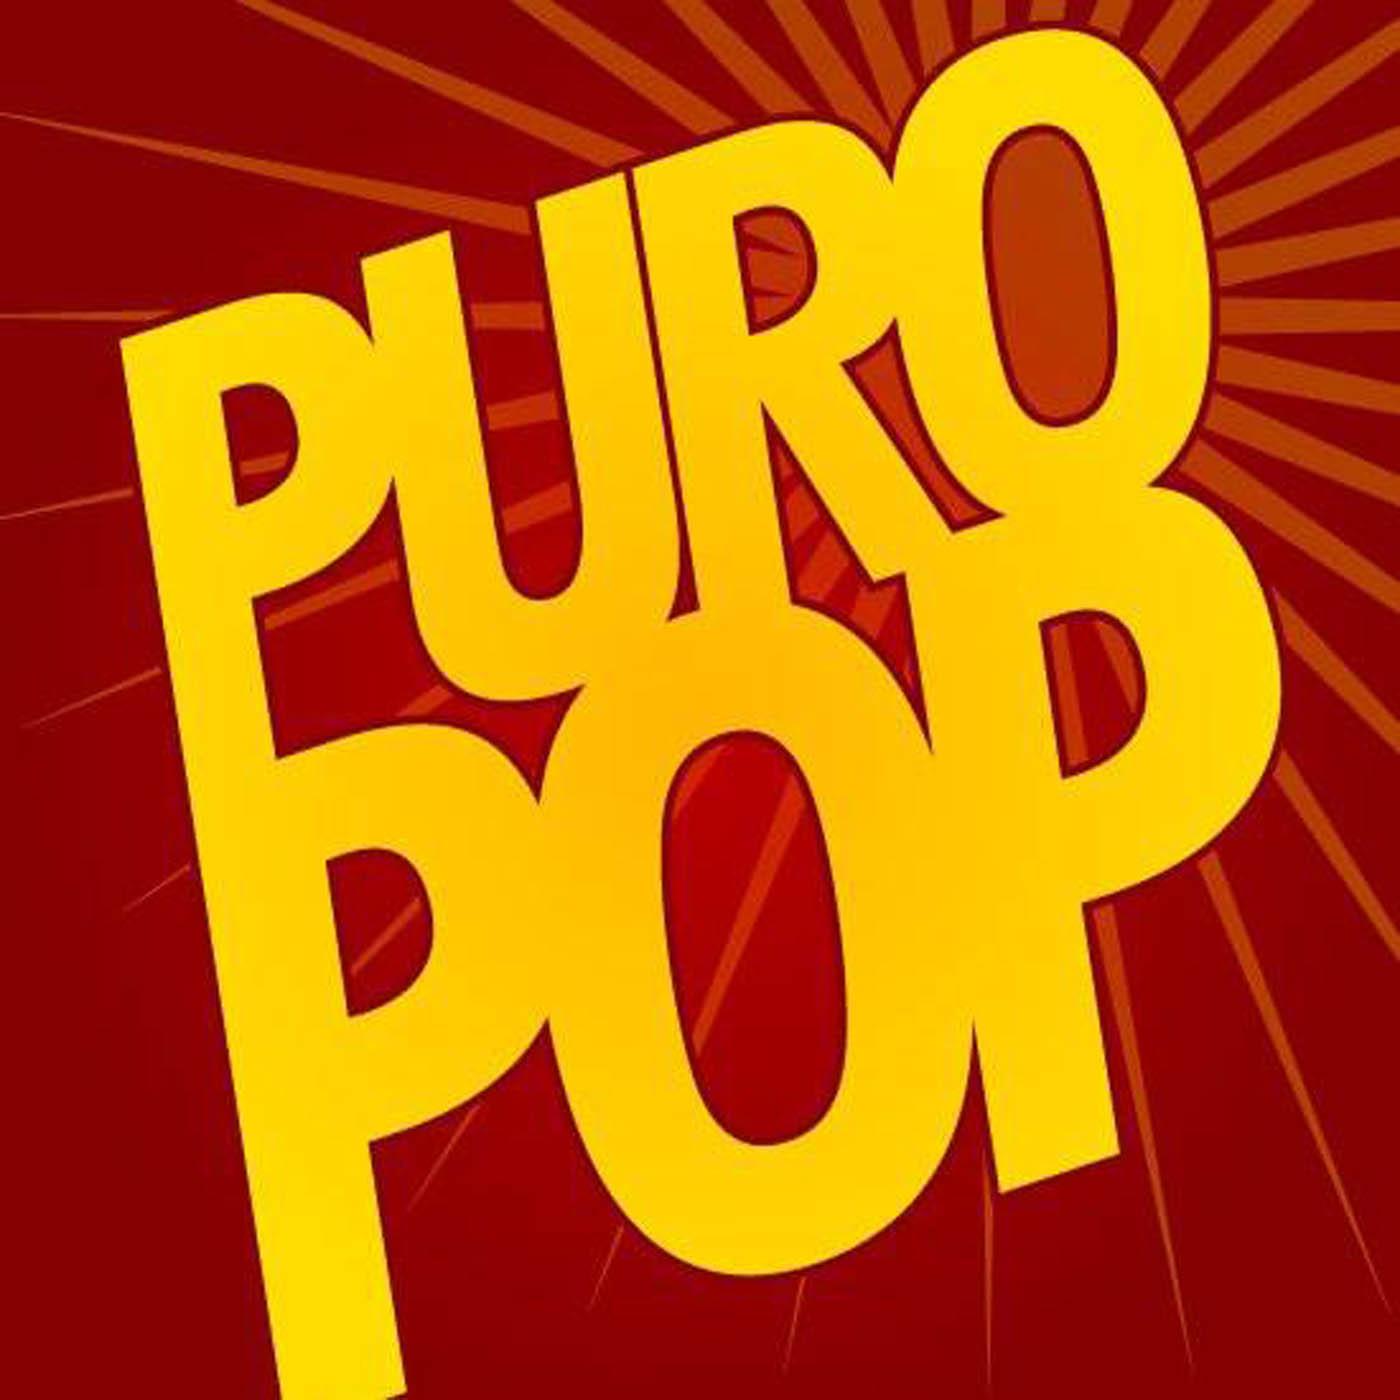 Puro Pop » Puro Pop Podcast